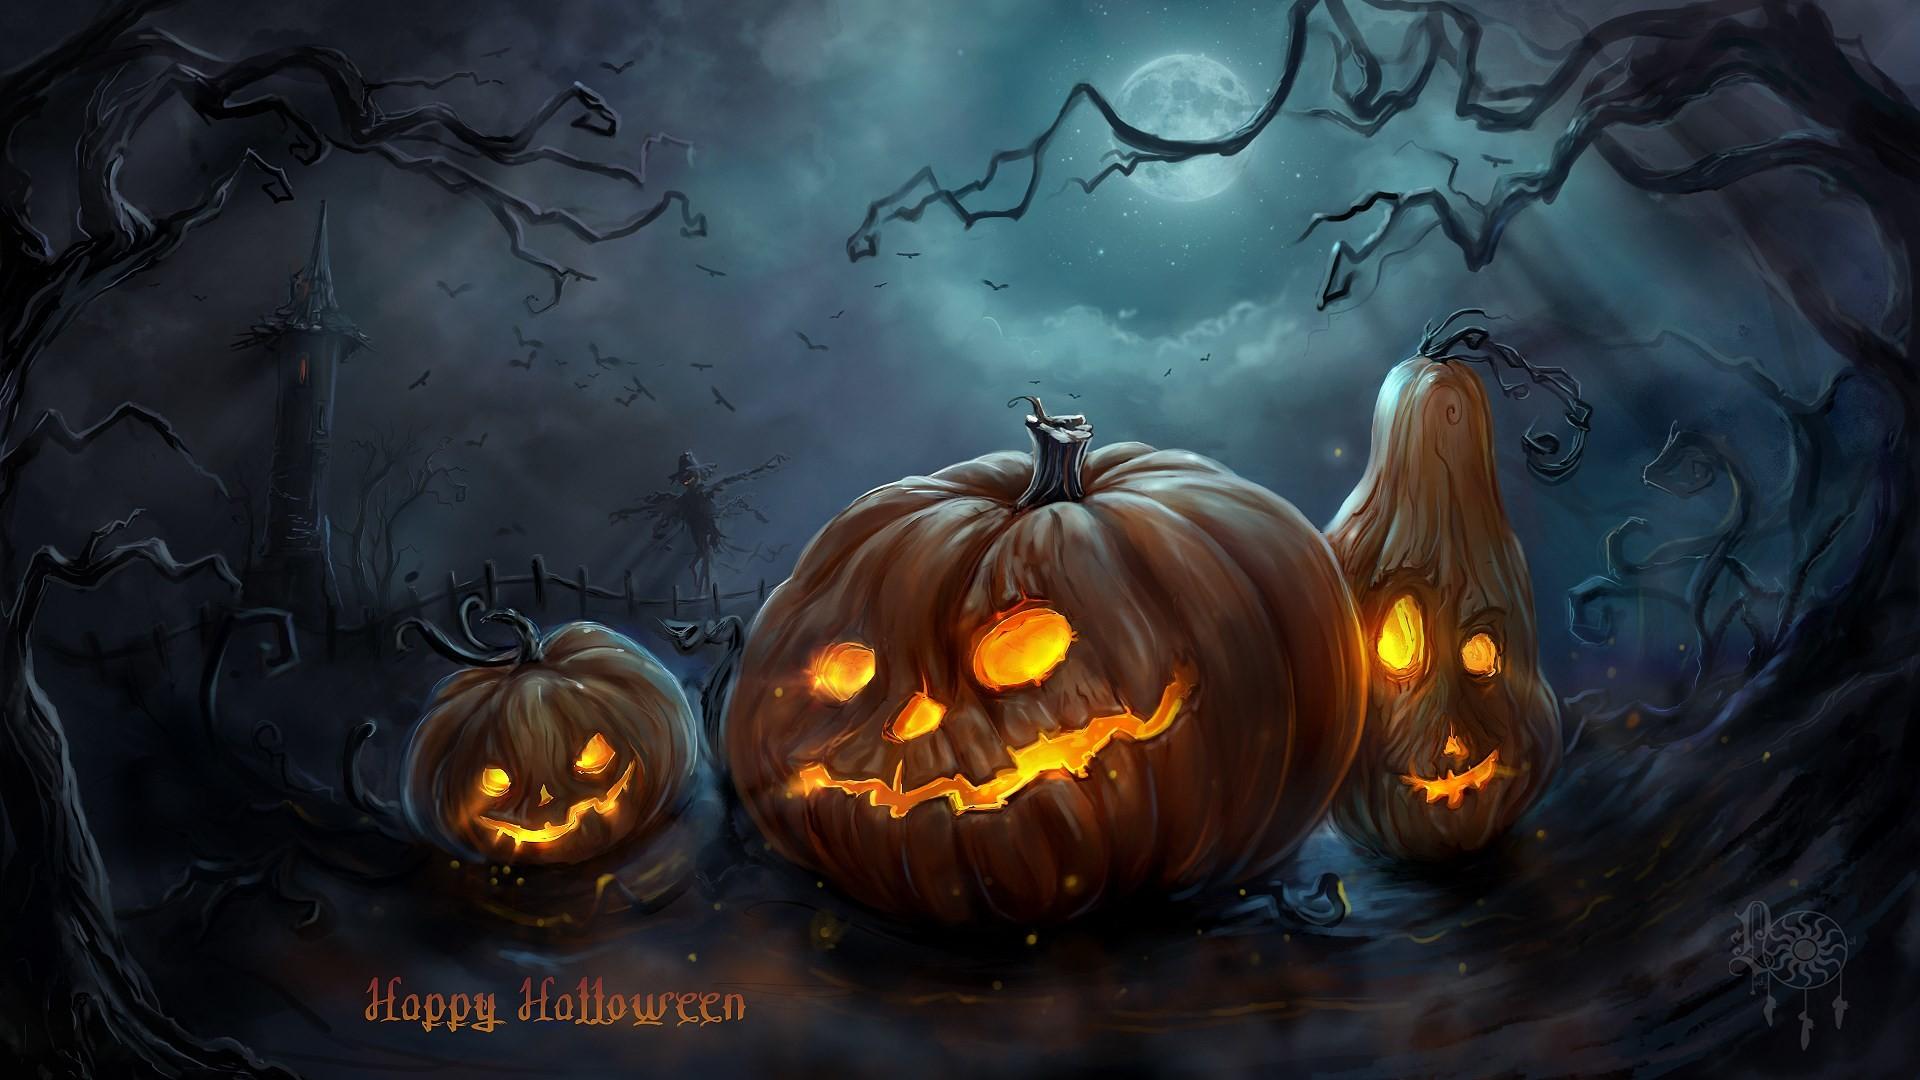 … New Art Halloween Night Pumpkins Moon || Home Ideas || /  294kB …